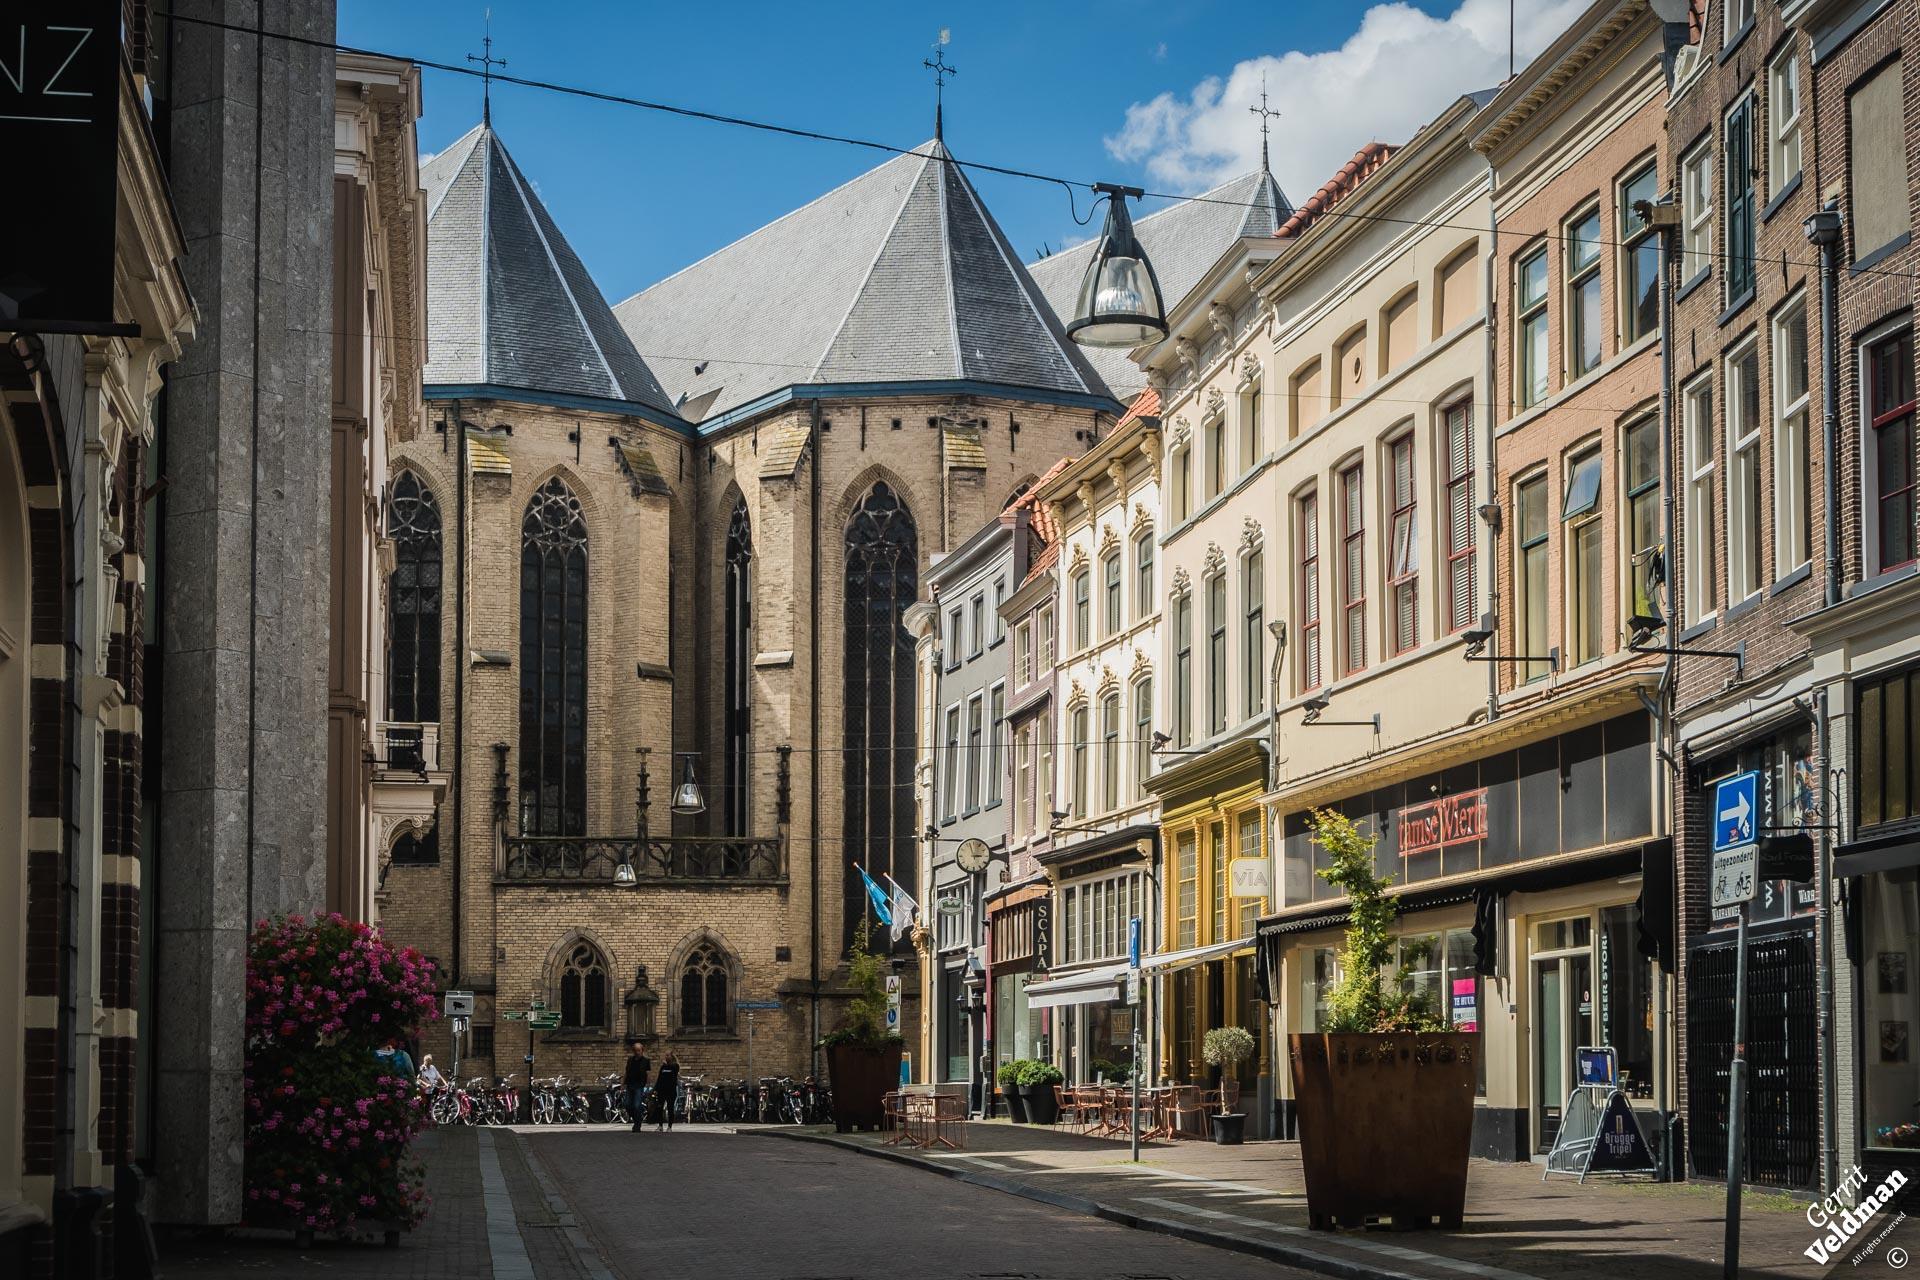 Sassenstraat, Zwolle